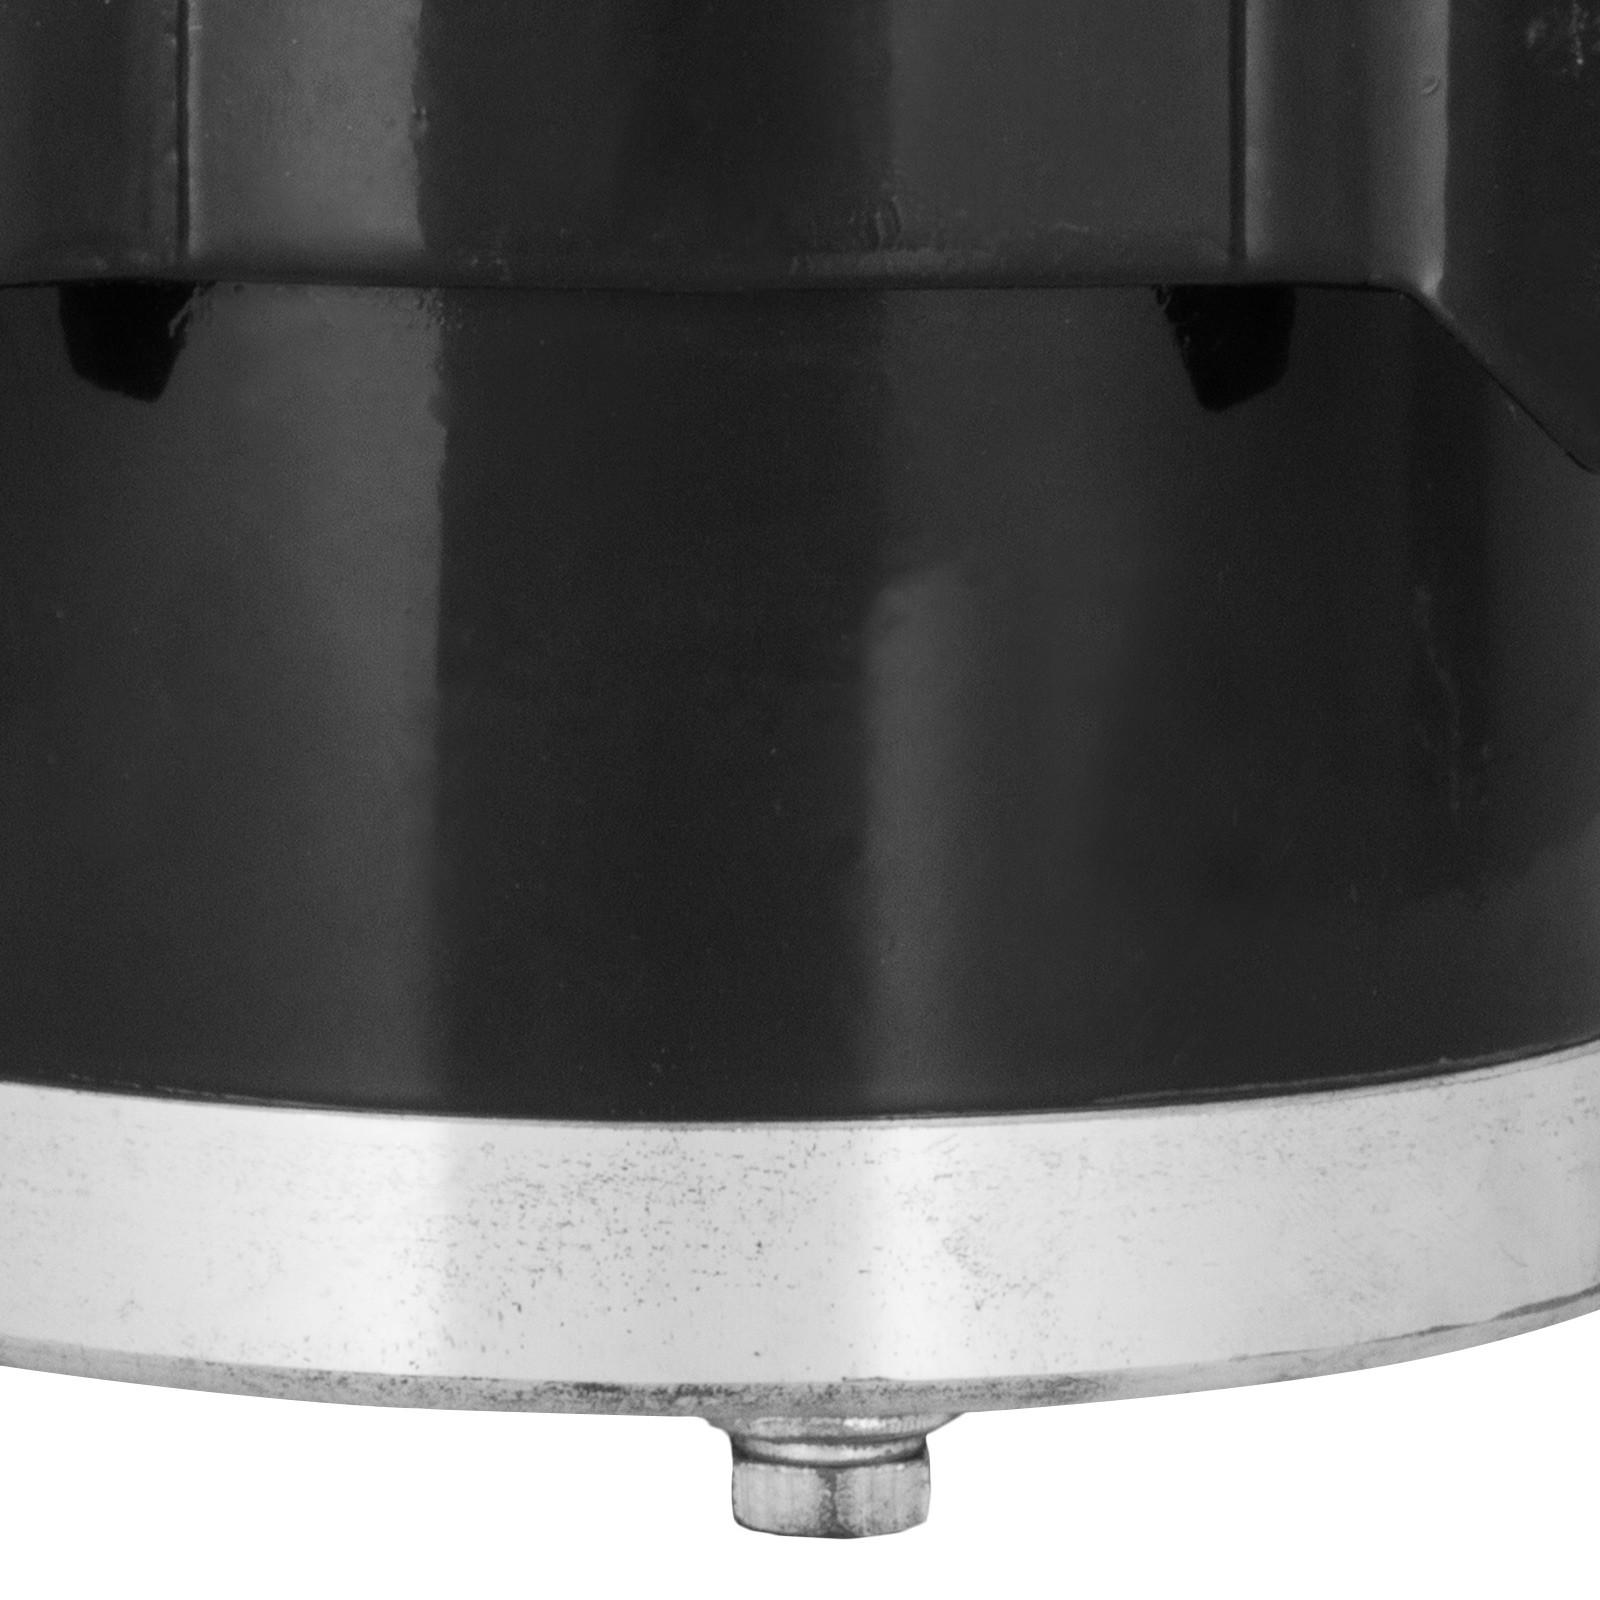 36v-Electric-Motor-controller-throttle-kit-f-Scooter-E-Scooter-ATV-Permanent thumbnail 80